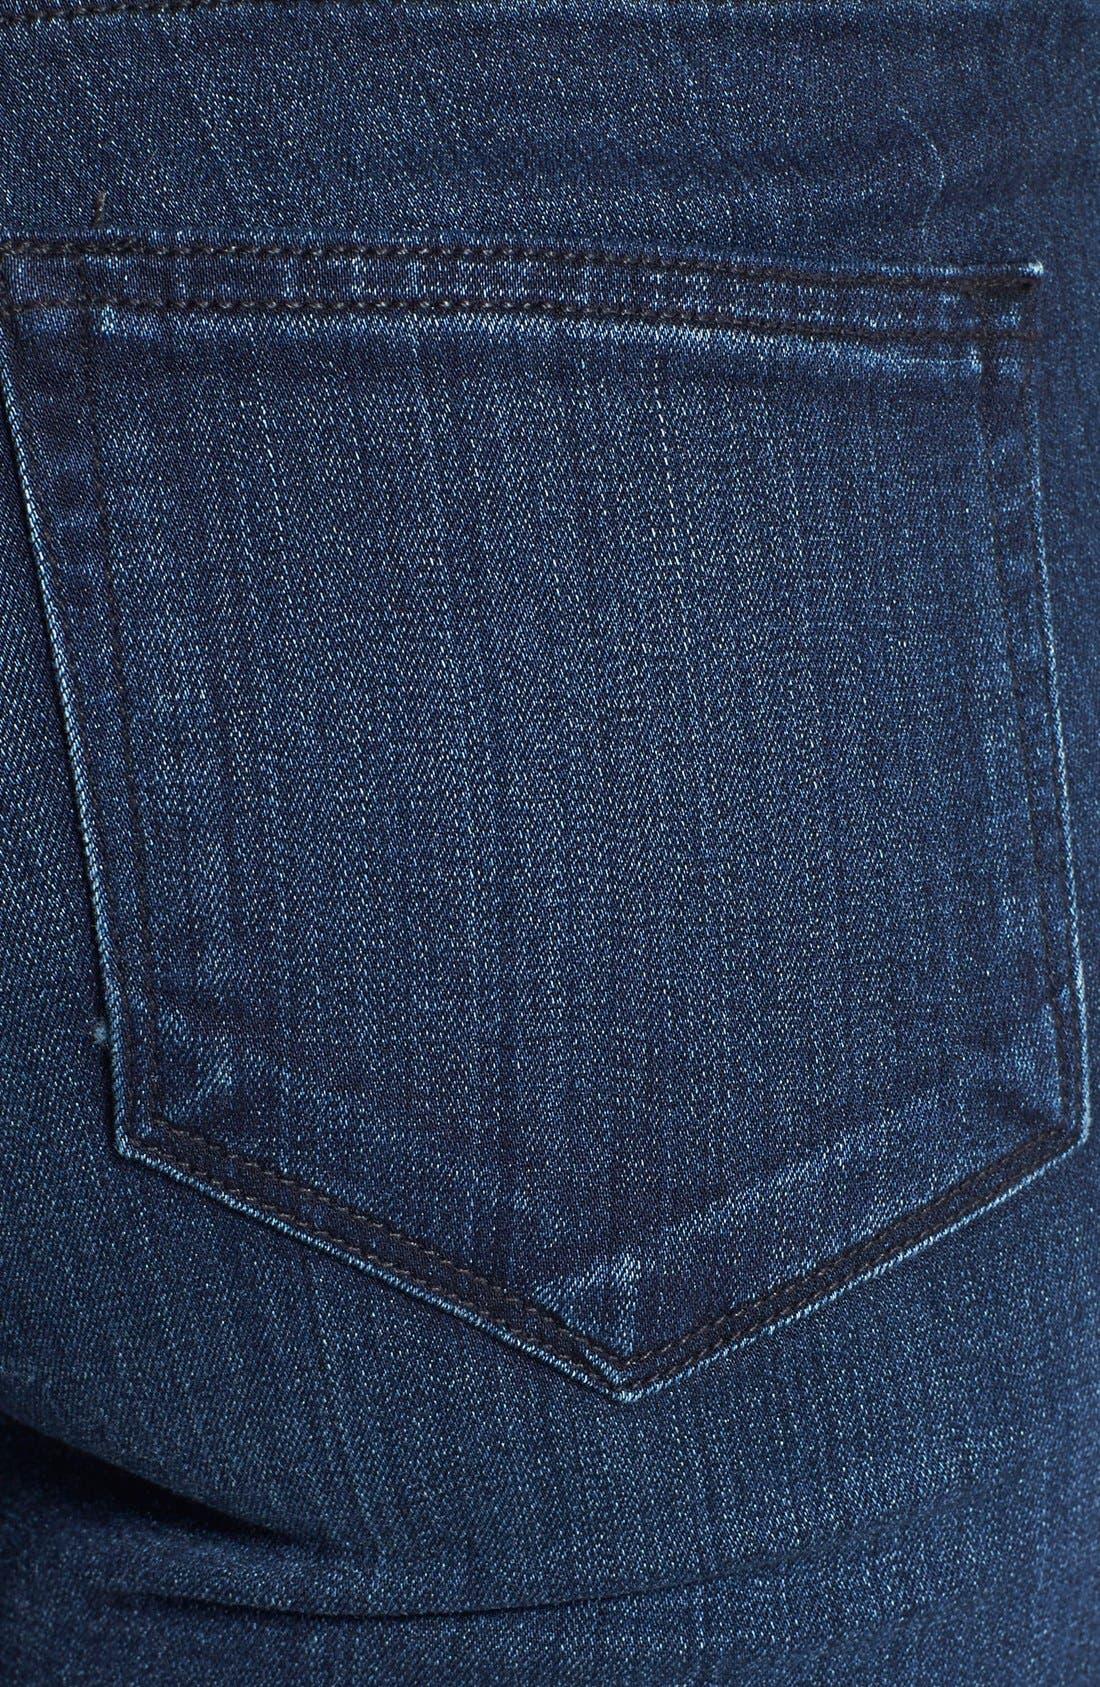 Alternate Image 3  - Paige Denim 'Transcend - Hoxton' High Rise Ankle Jeans (Valor)